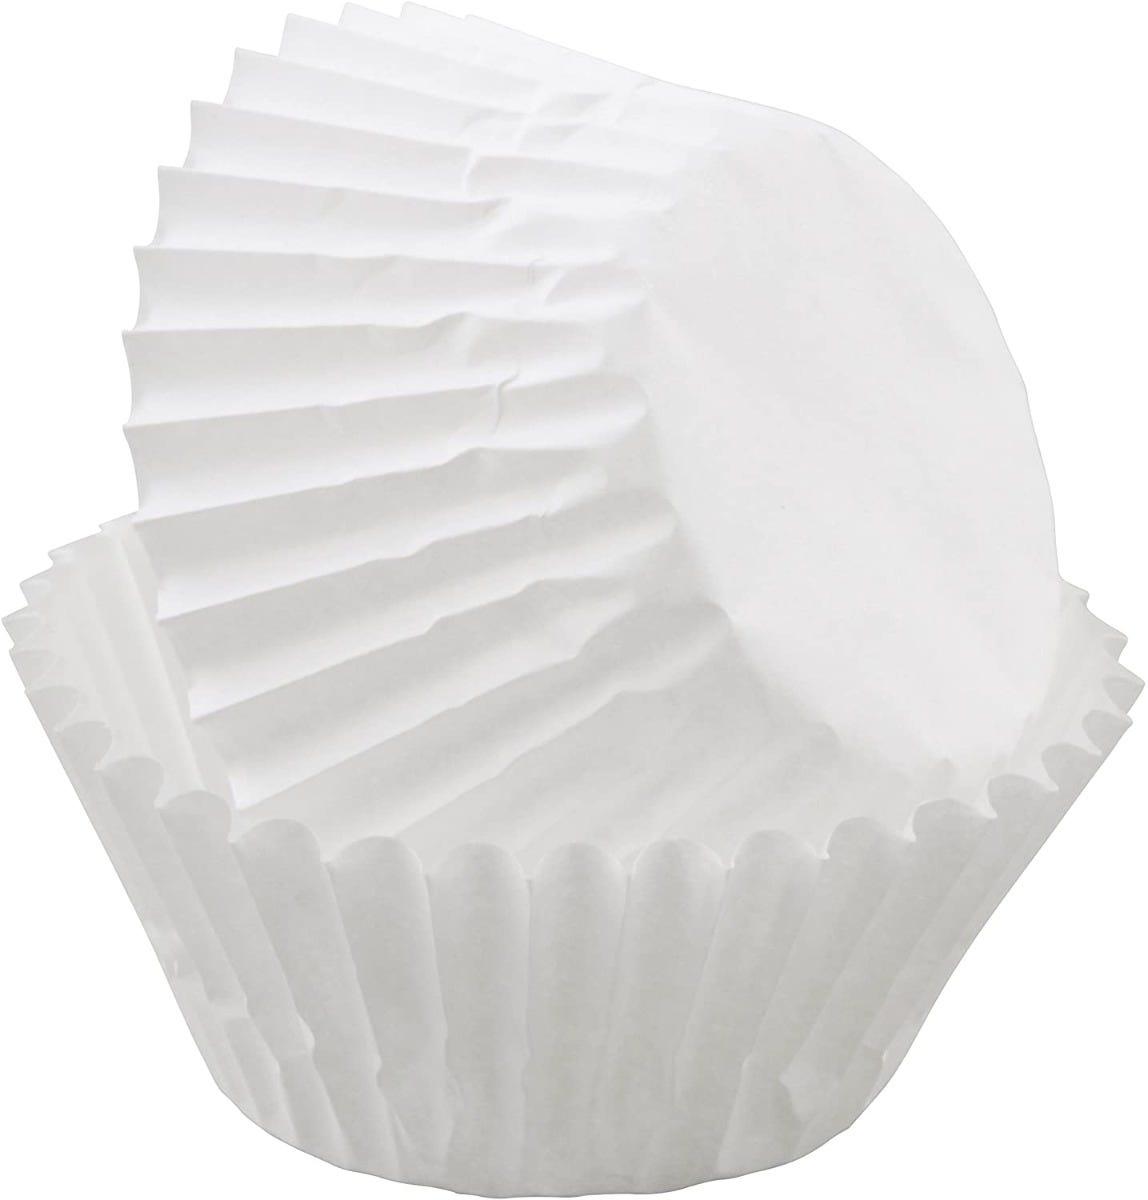 Capacillos para muffin de papel Wilton®, Set de 100 pzas.